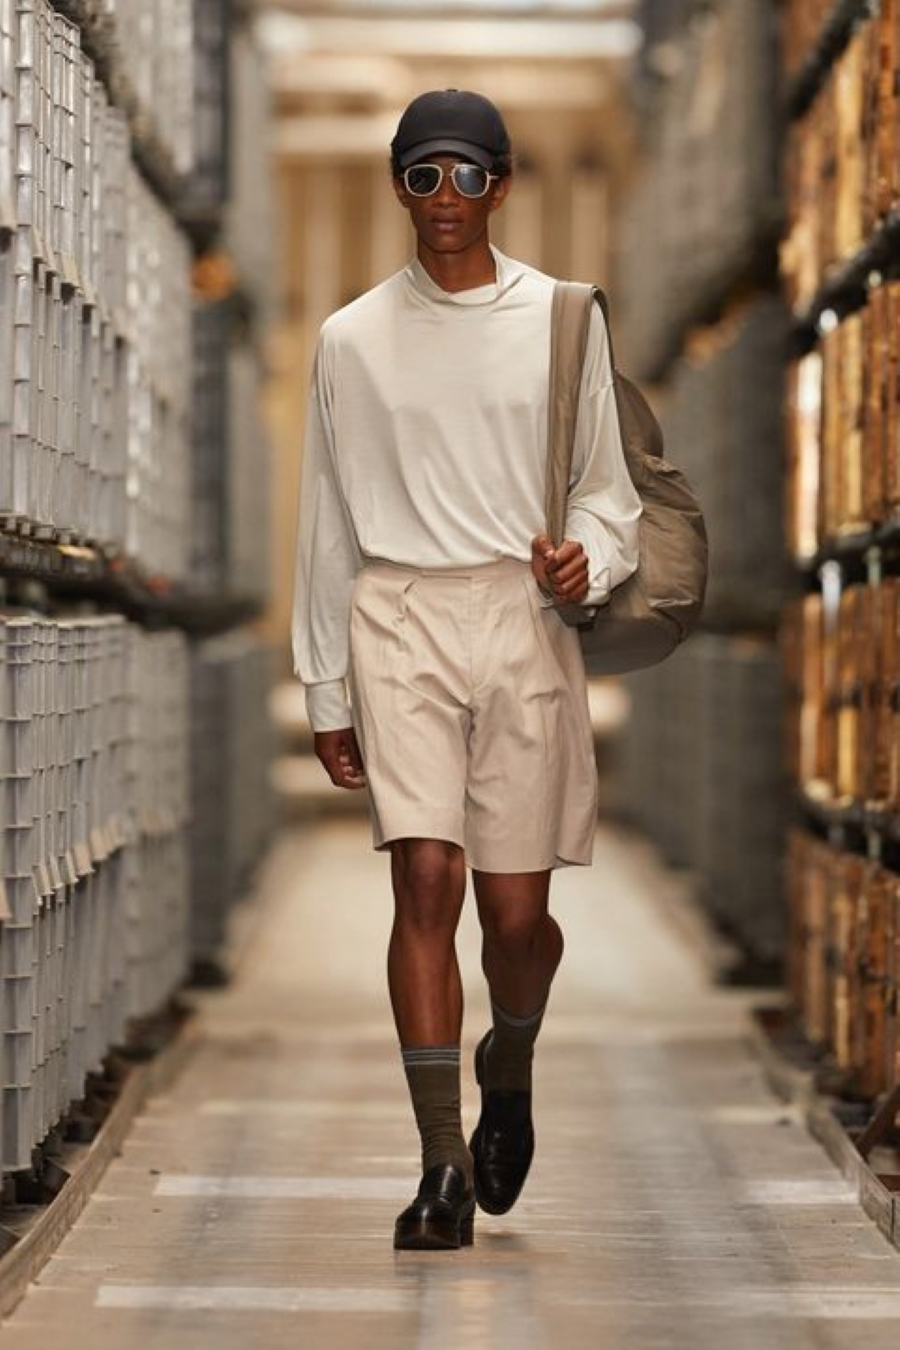 quan short bermuda - elleman - 0421 - elle man style calendar - smart casual - cr fashion book